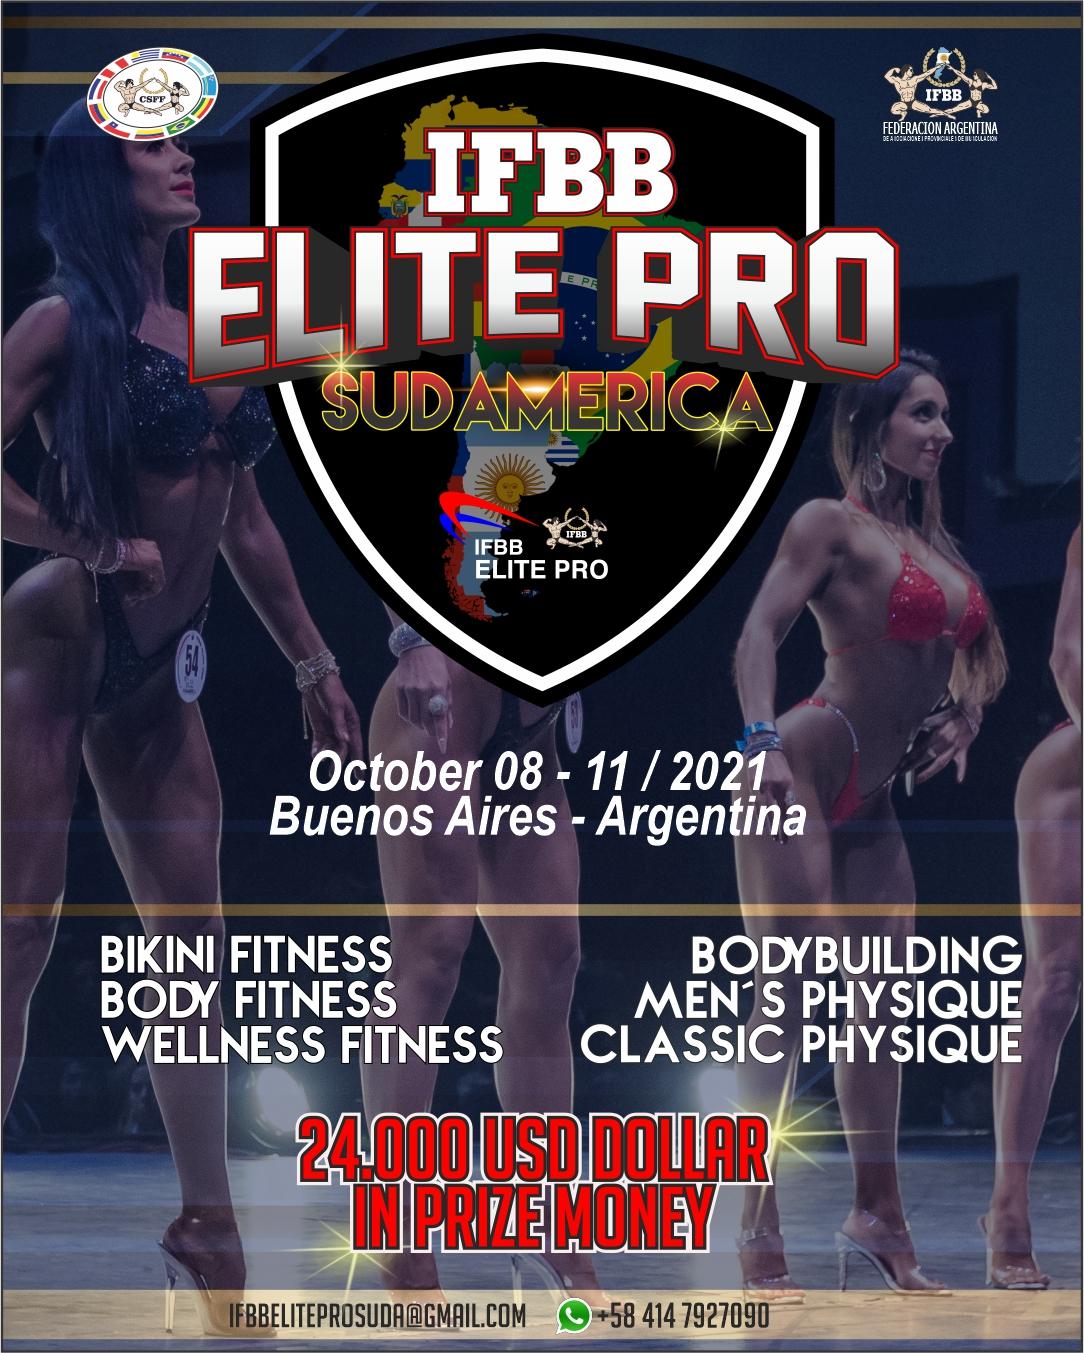 Campeonato IFBB Elite Pro Sudamérica 2021